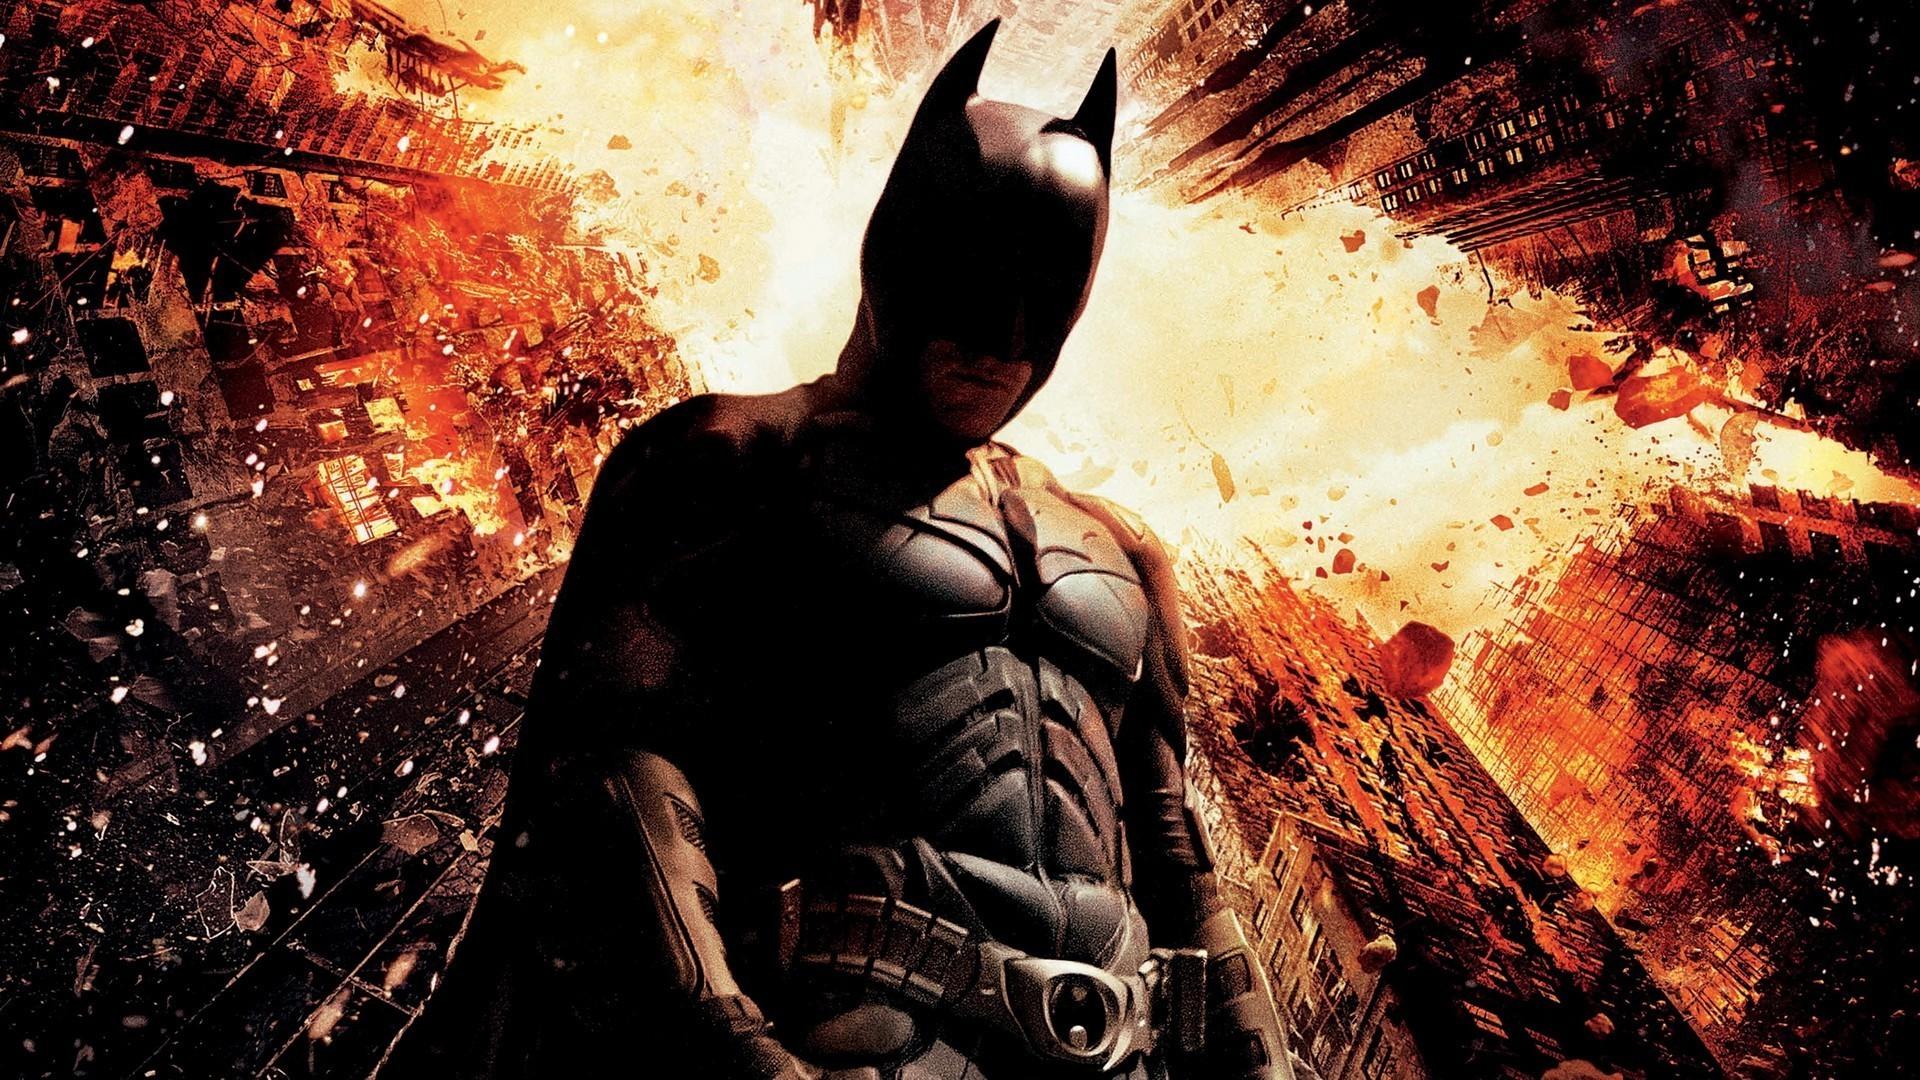 The Lego Batman Movie 4k - High Resolution Batman The Dark Knight Rises , HD Wallpaper & Backgrounds